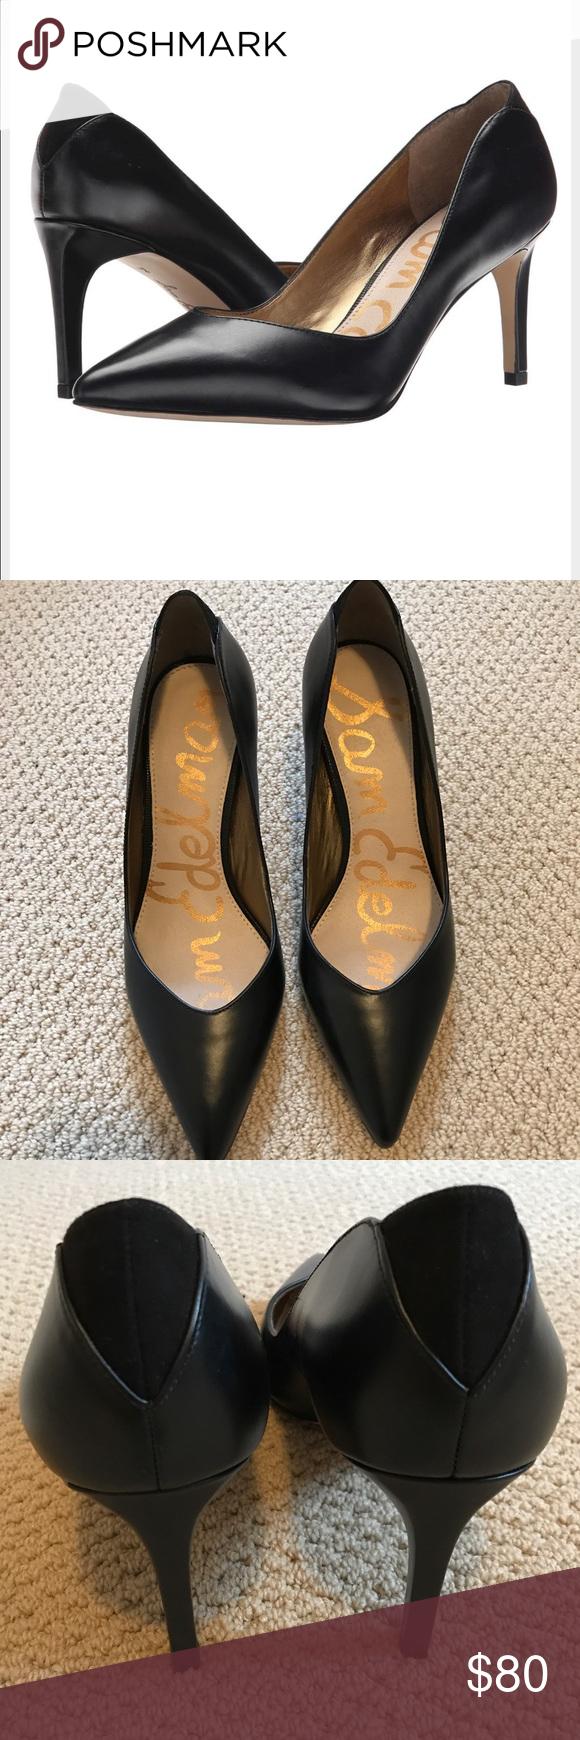 Sam Edelman Heels Sam Edelman Orella Heels. Brand New, never worn! Sam Edelman Shoes Heels